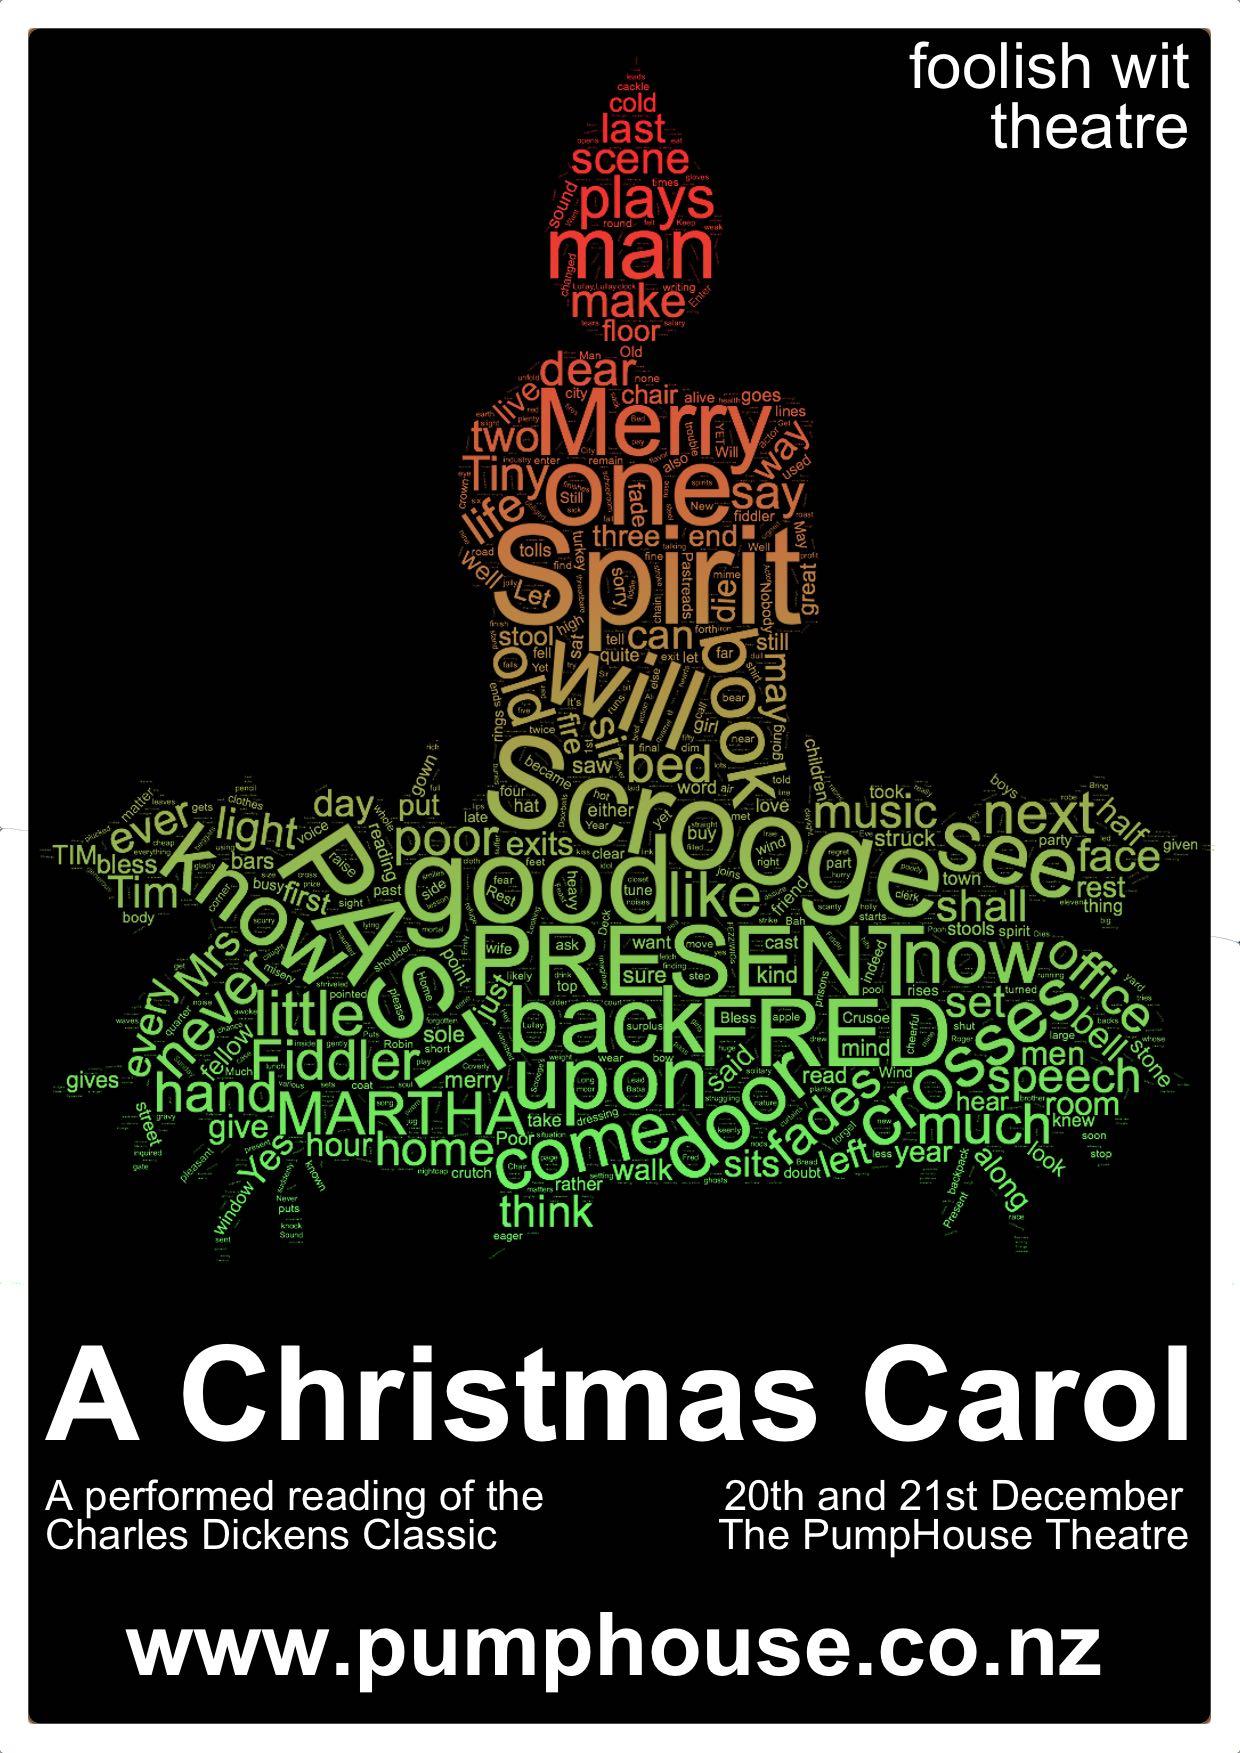 A Christmas Carol Poster.A Christmas Carol Poster The Pumphouse Theatre